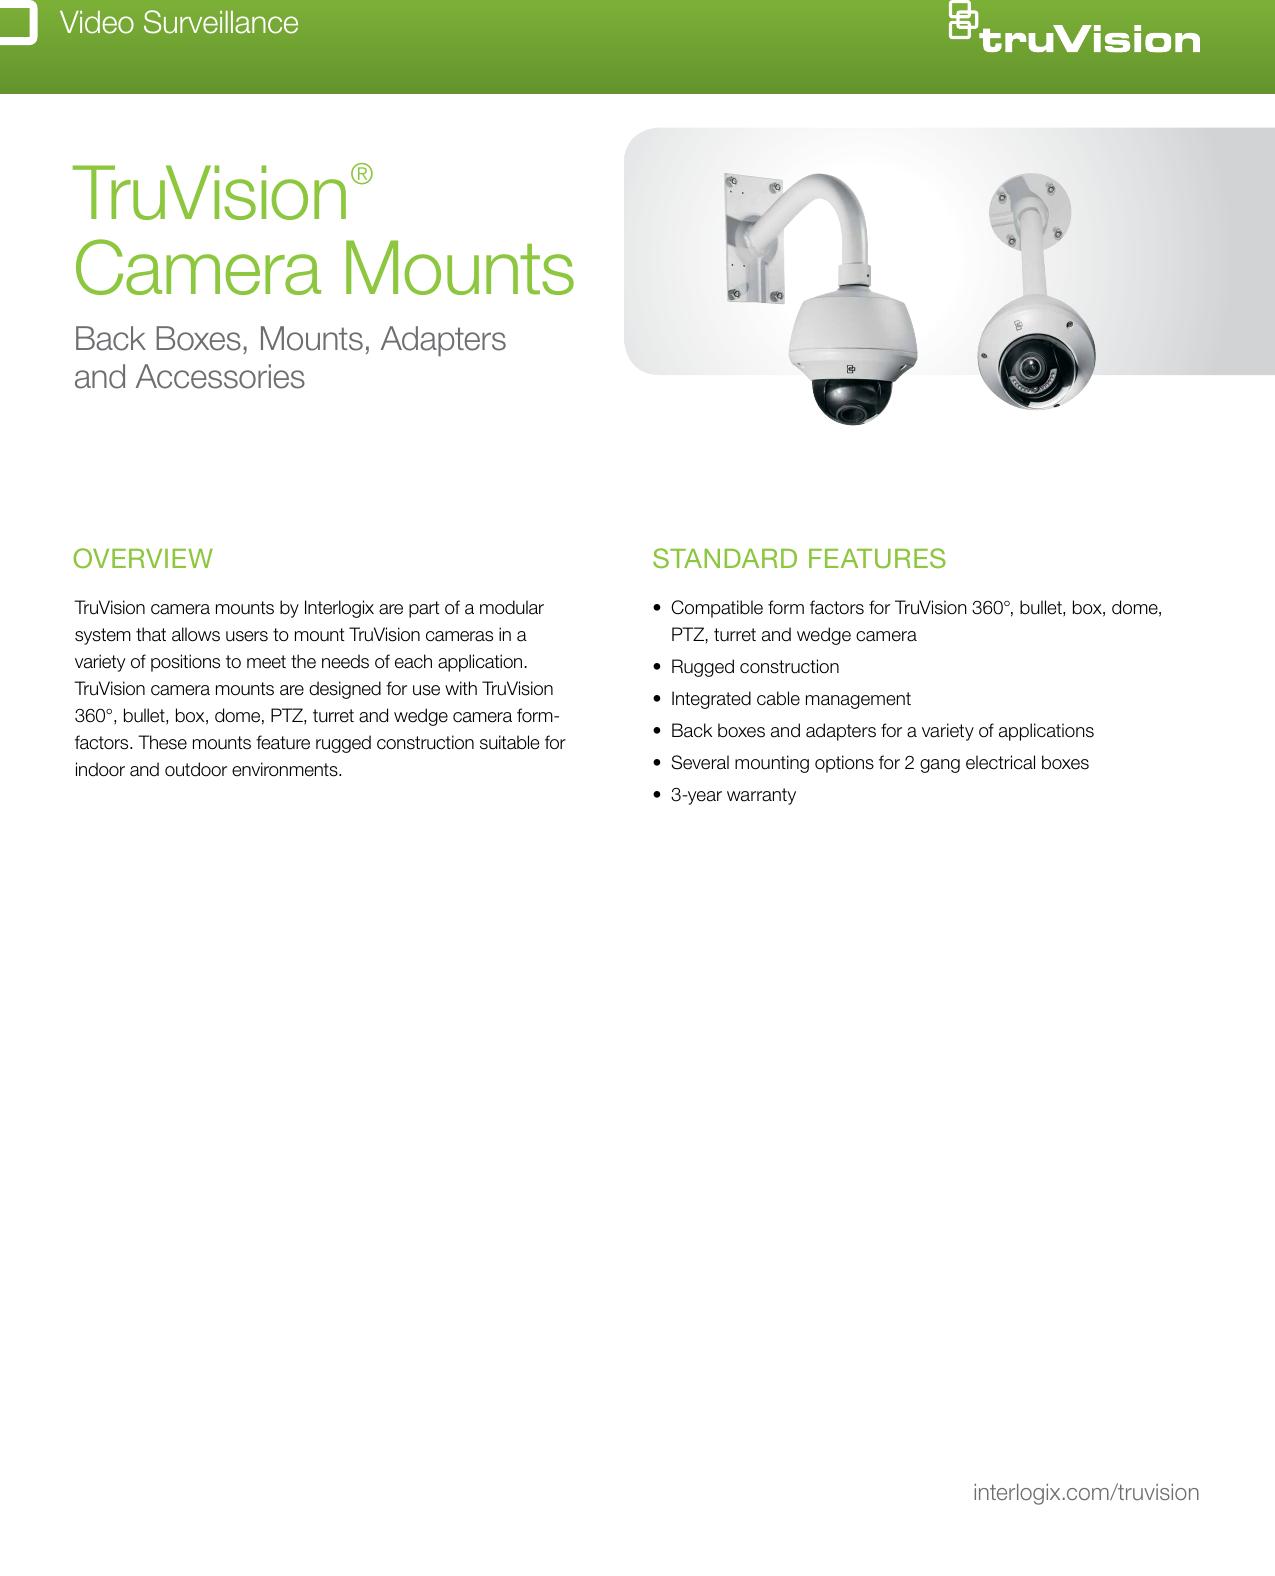 Interlogix TVD-BB3 TruVision Dome Back Box